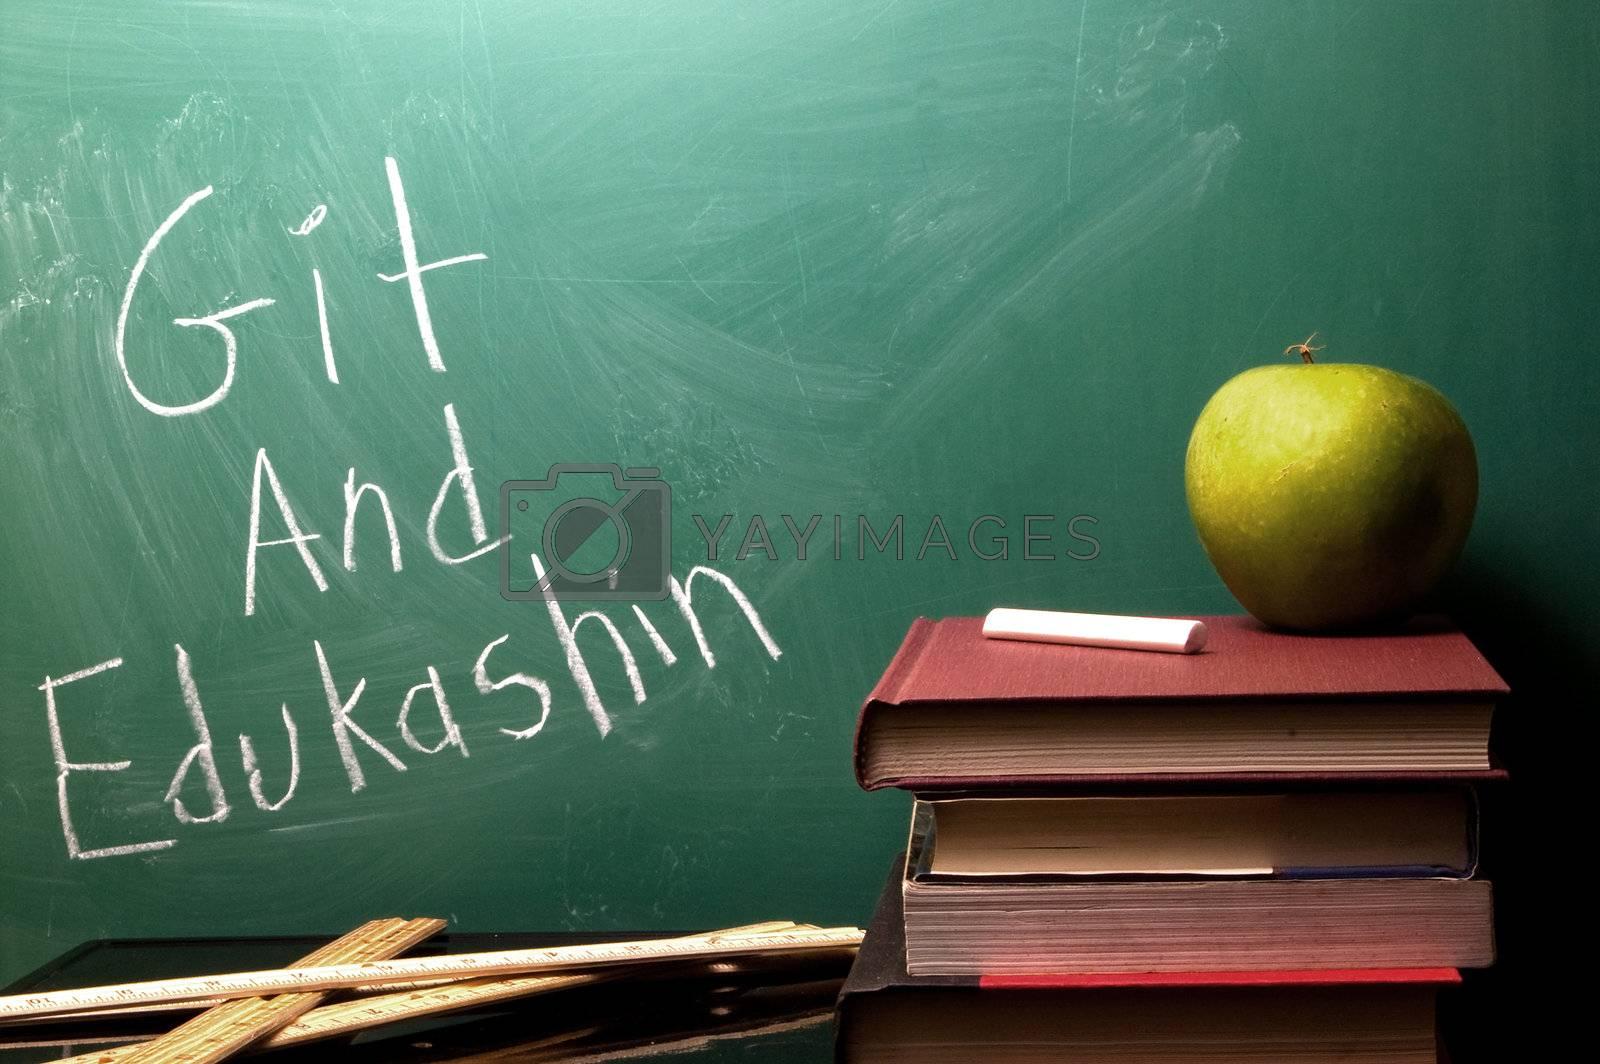 A chalkboard with Git and Edukashin written on it.